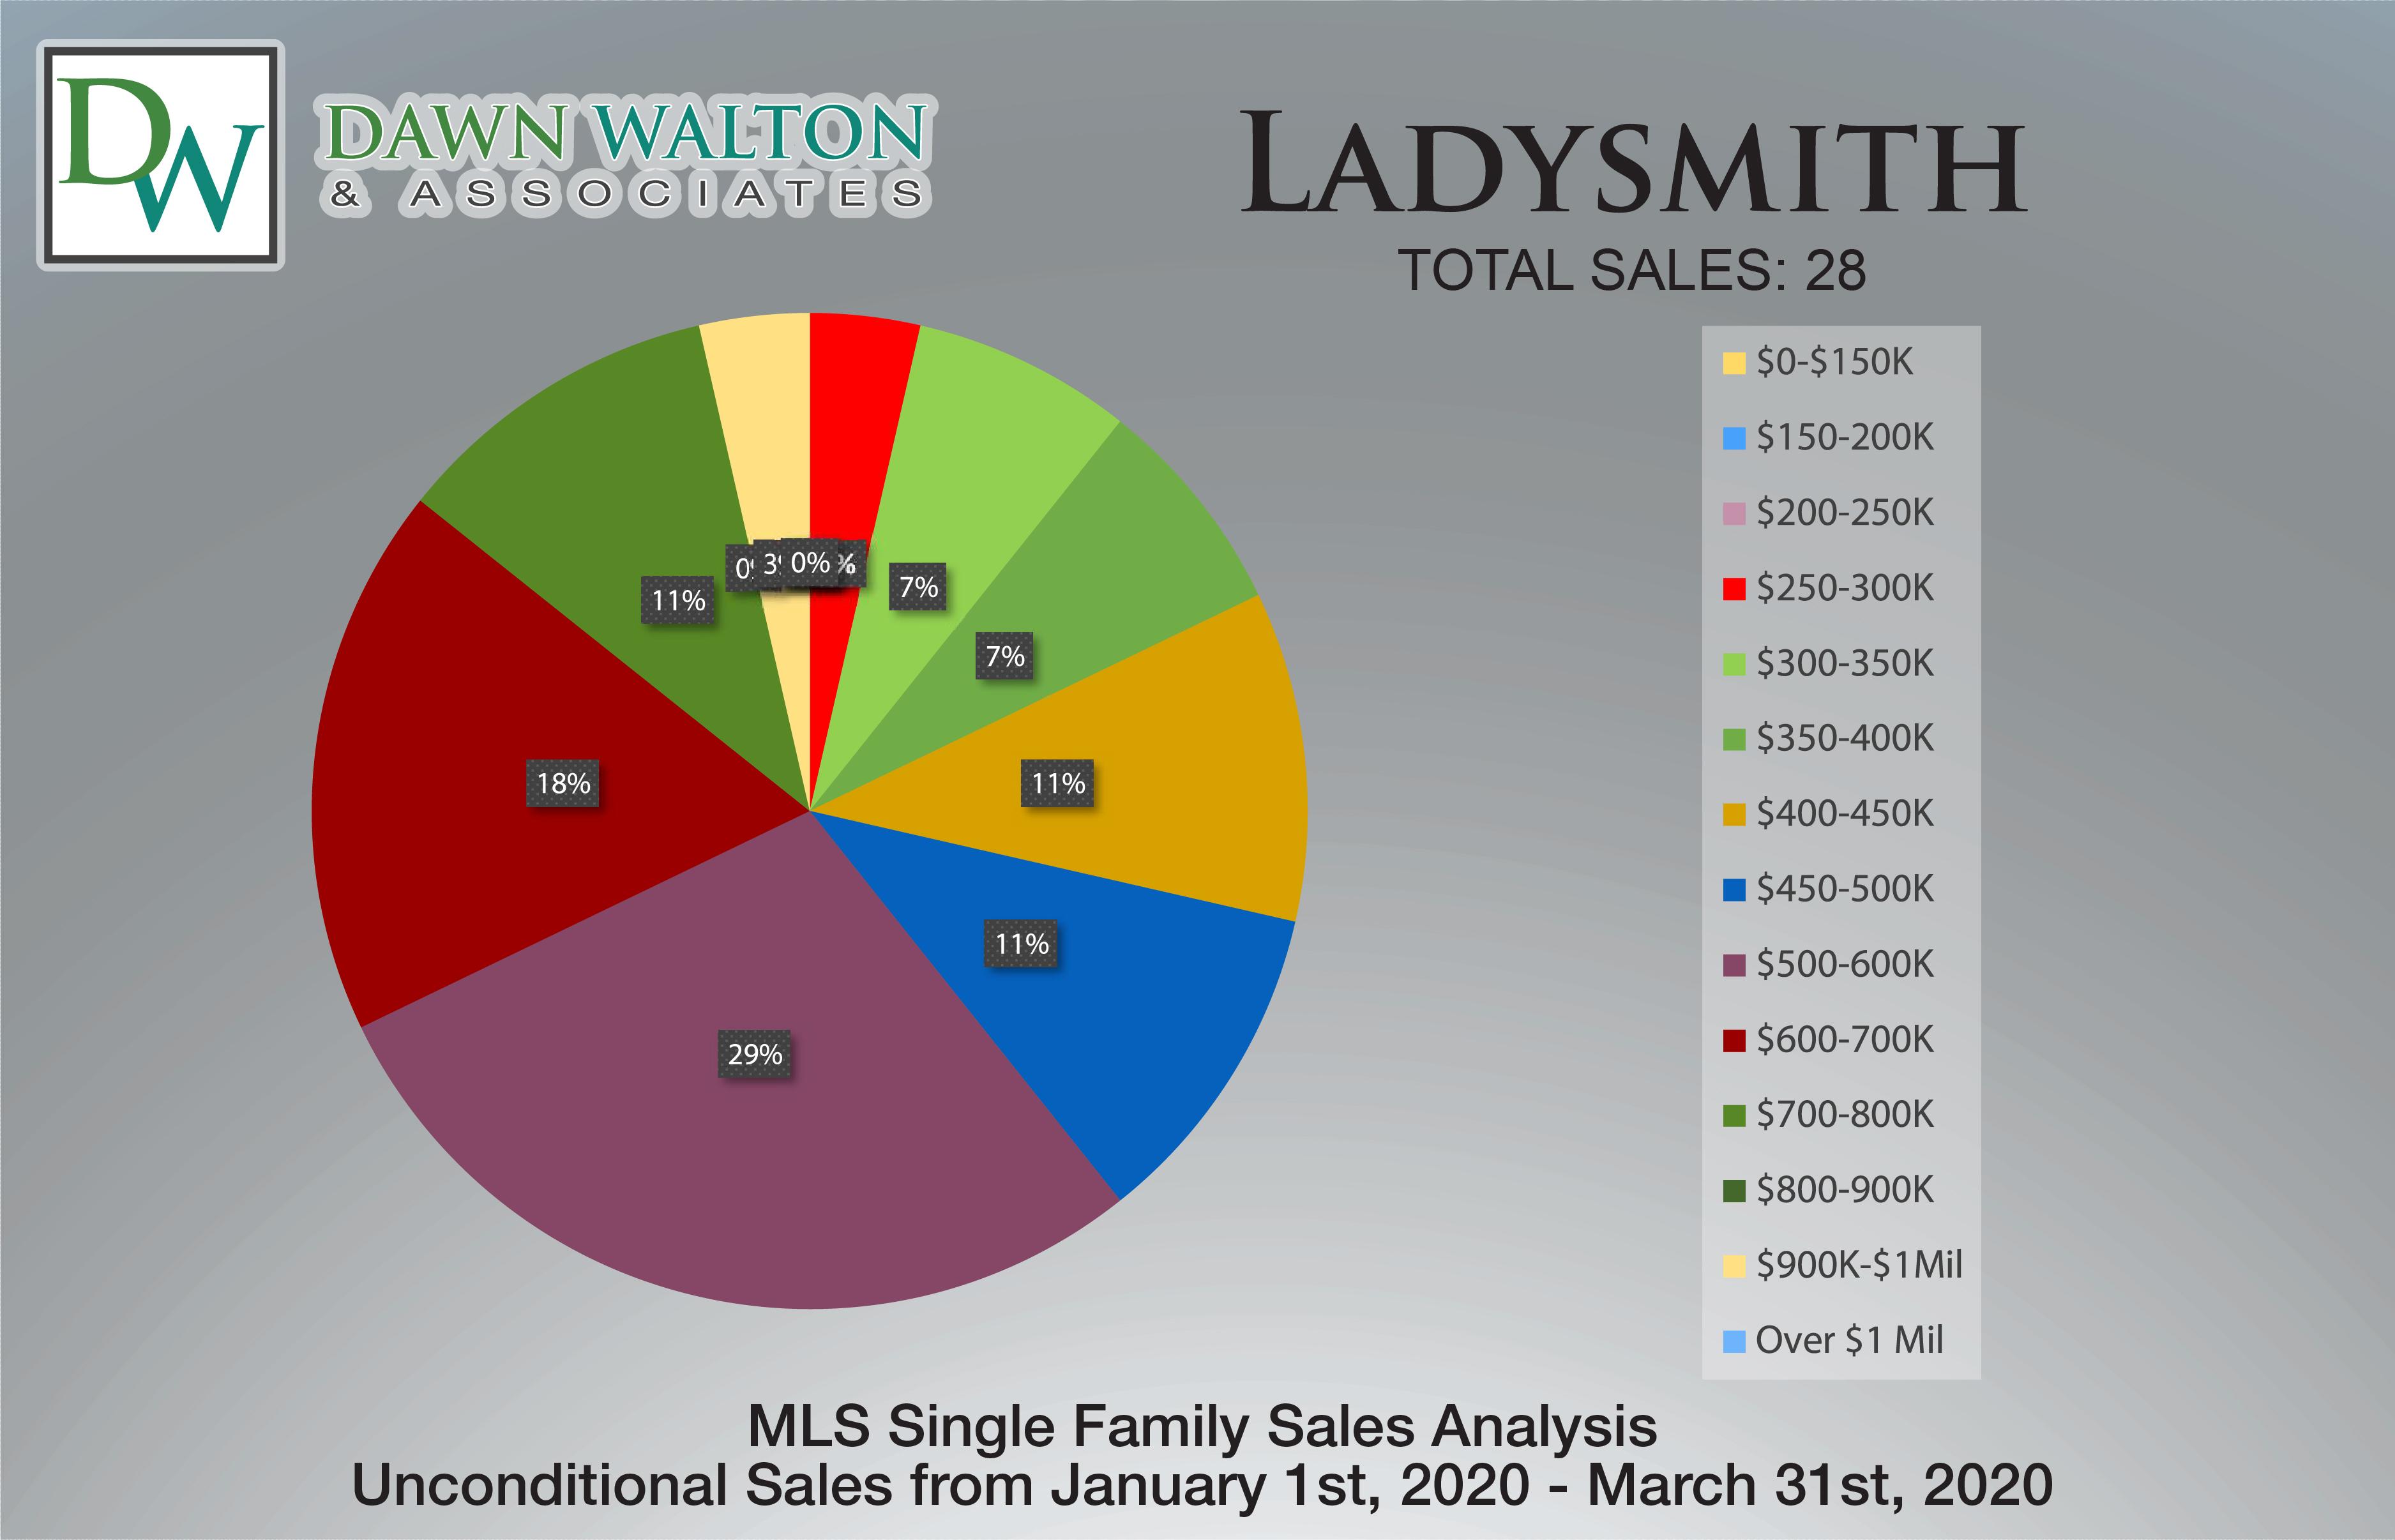 Ladysmith Real Estate Market Stats Price Percentage Jan 1-Mar 31 2020 - Nanaimo Realtor Dawn Walton